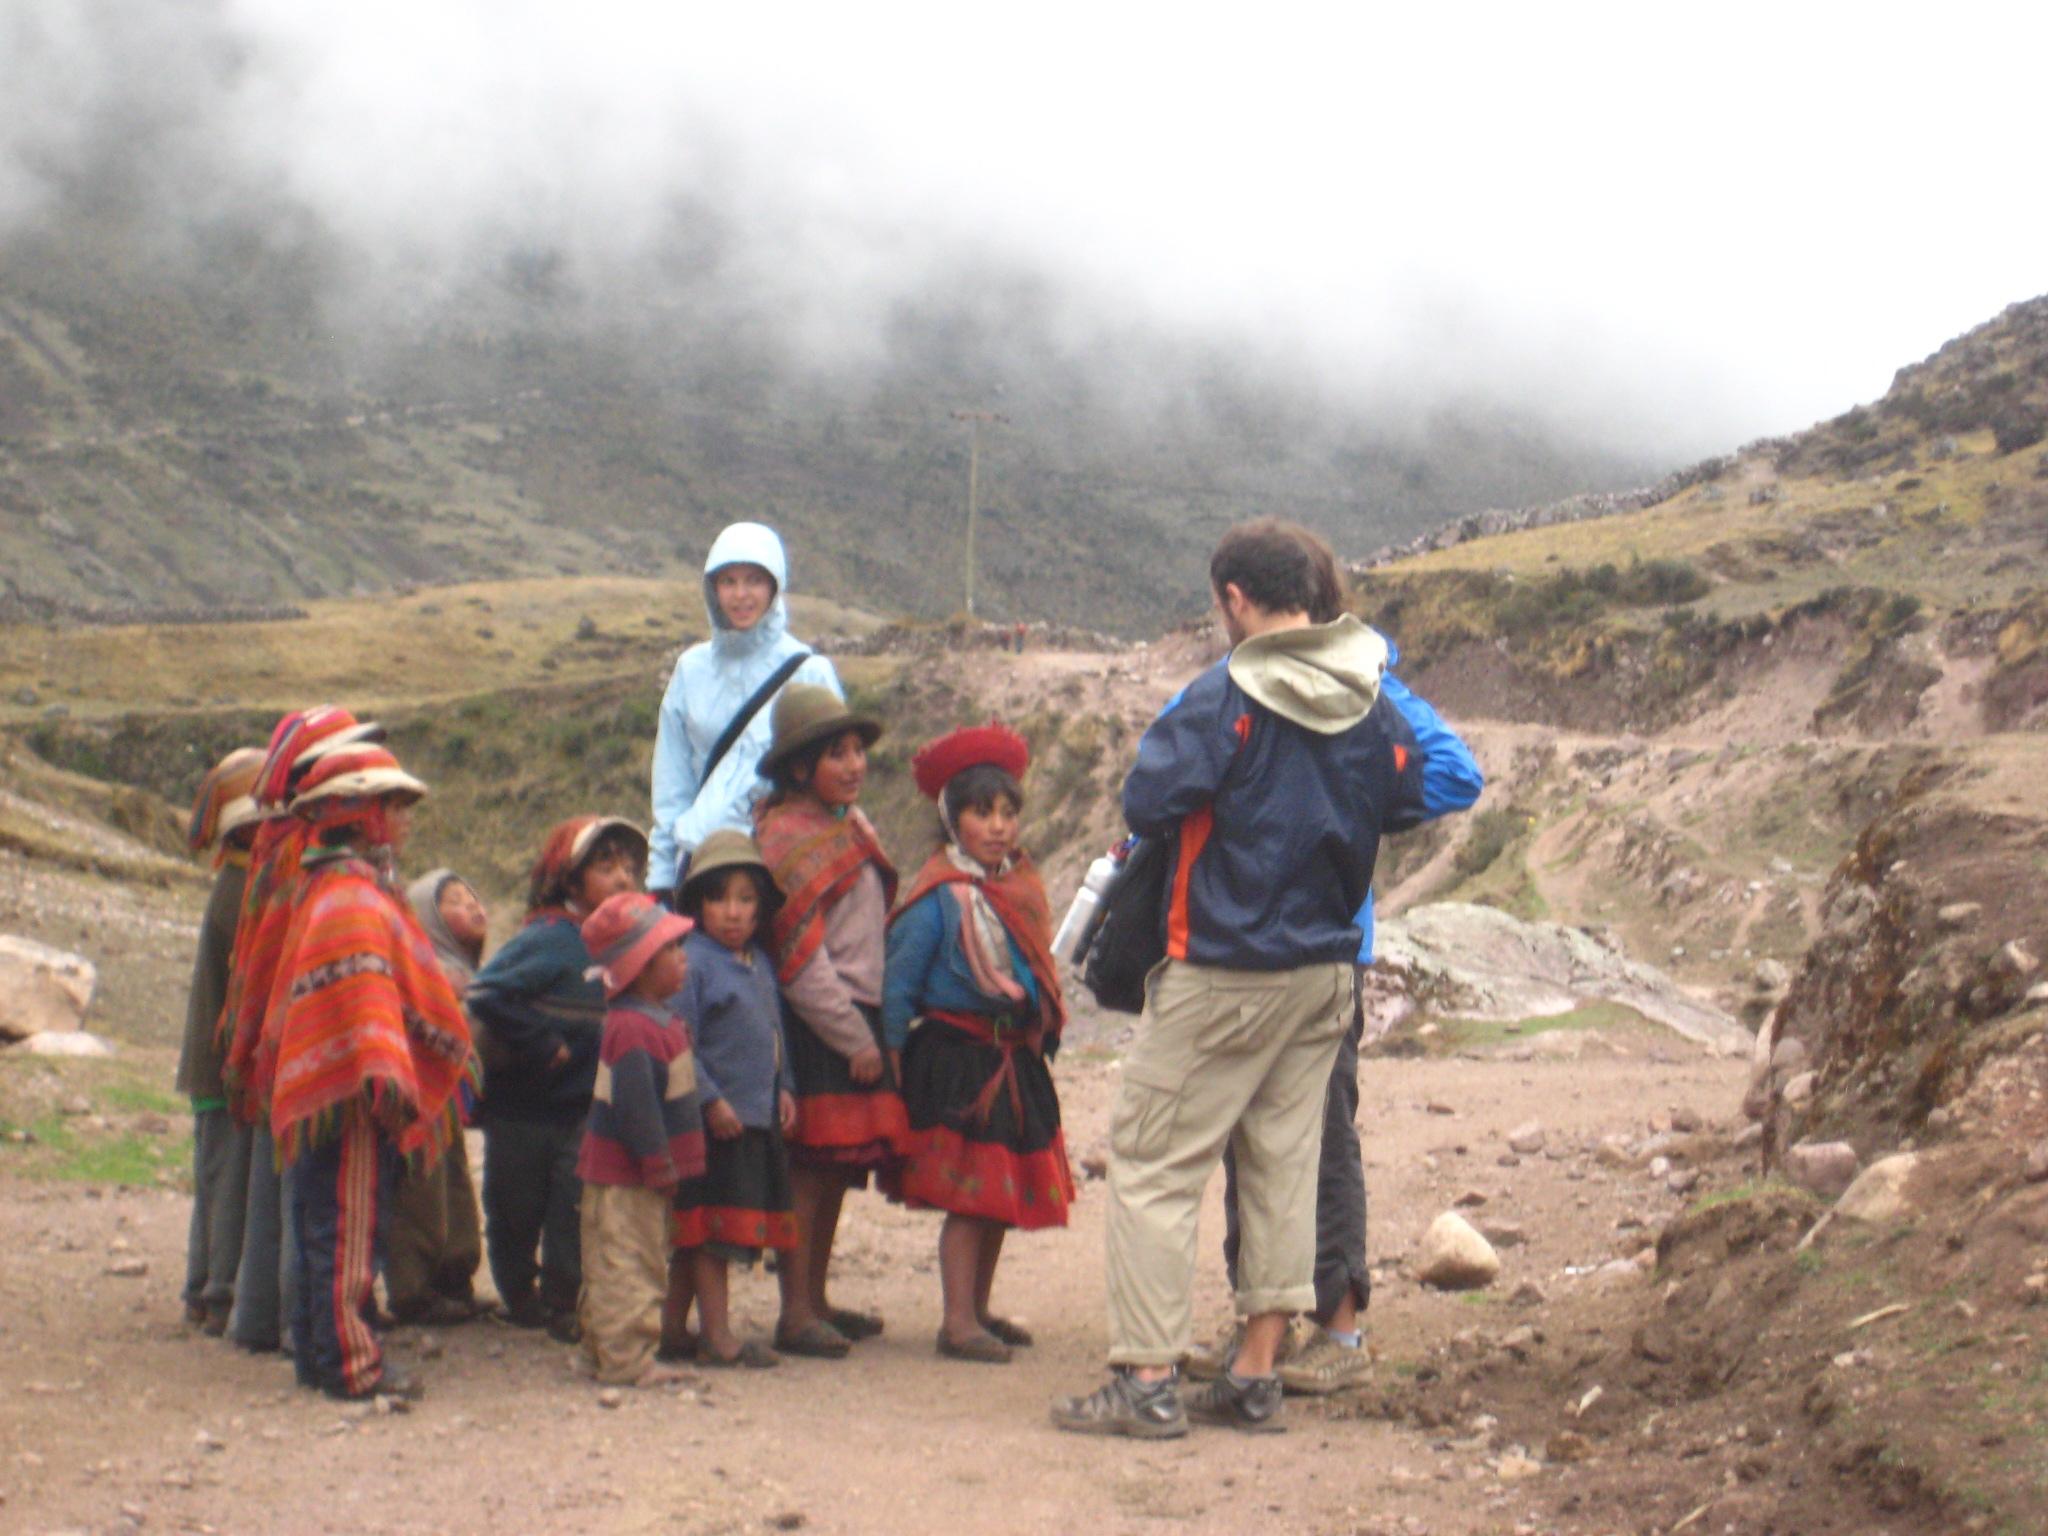 Local kids seeking candy